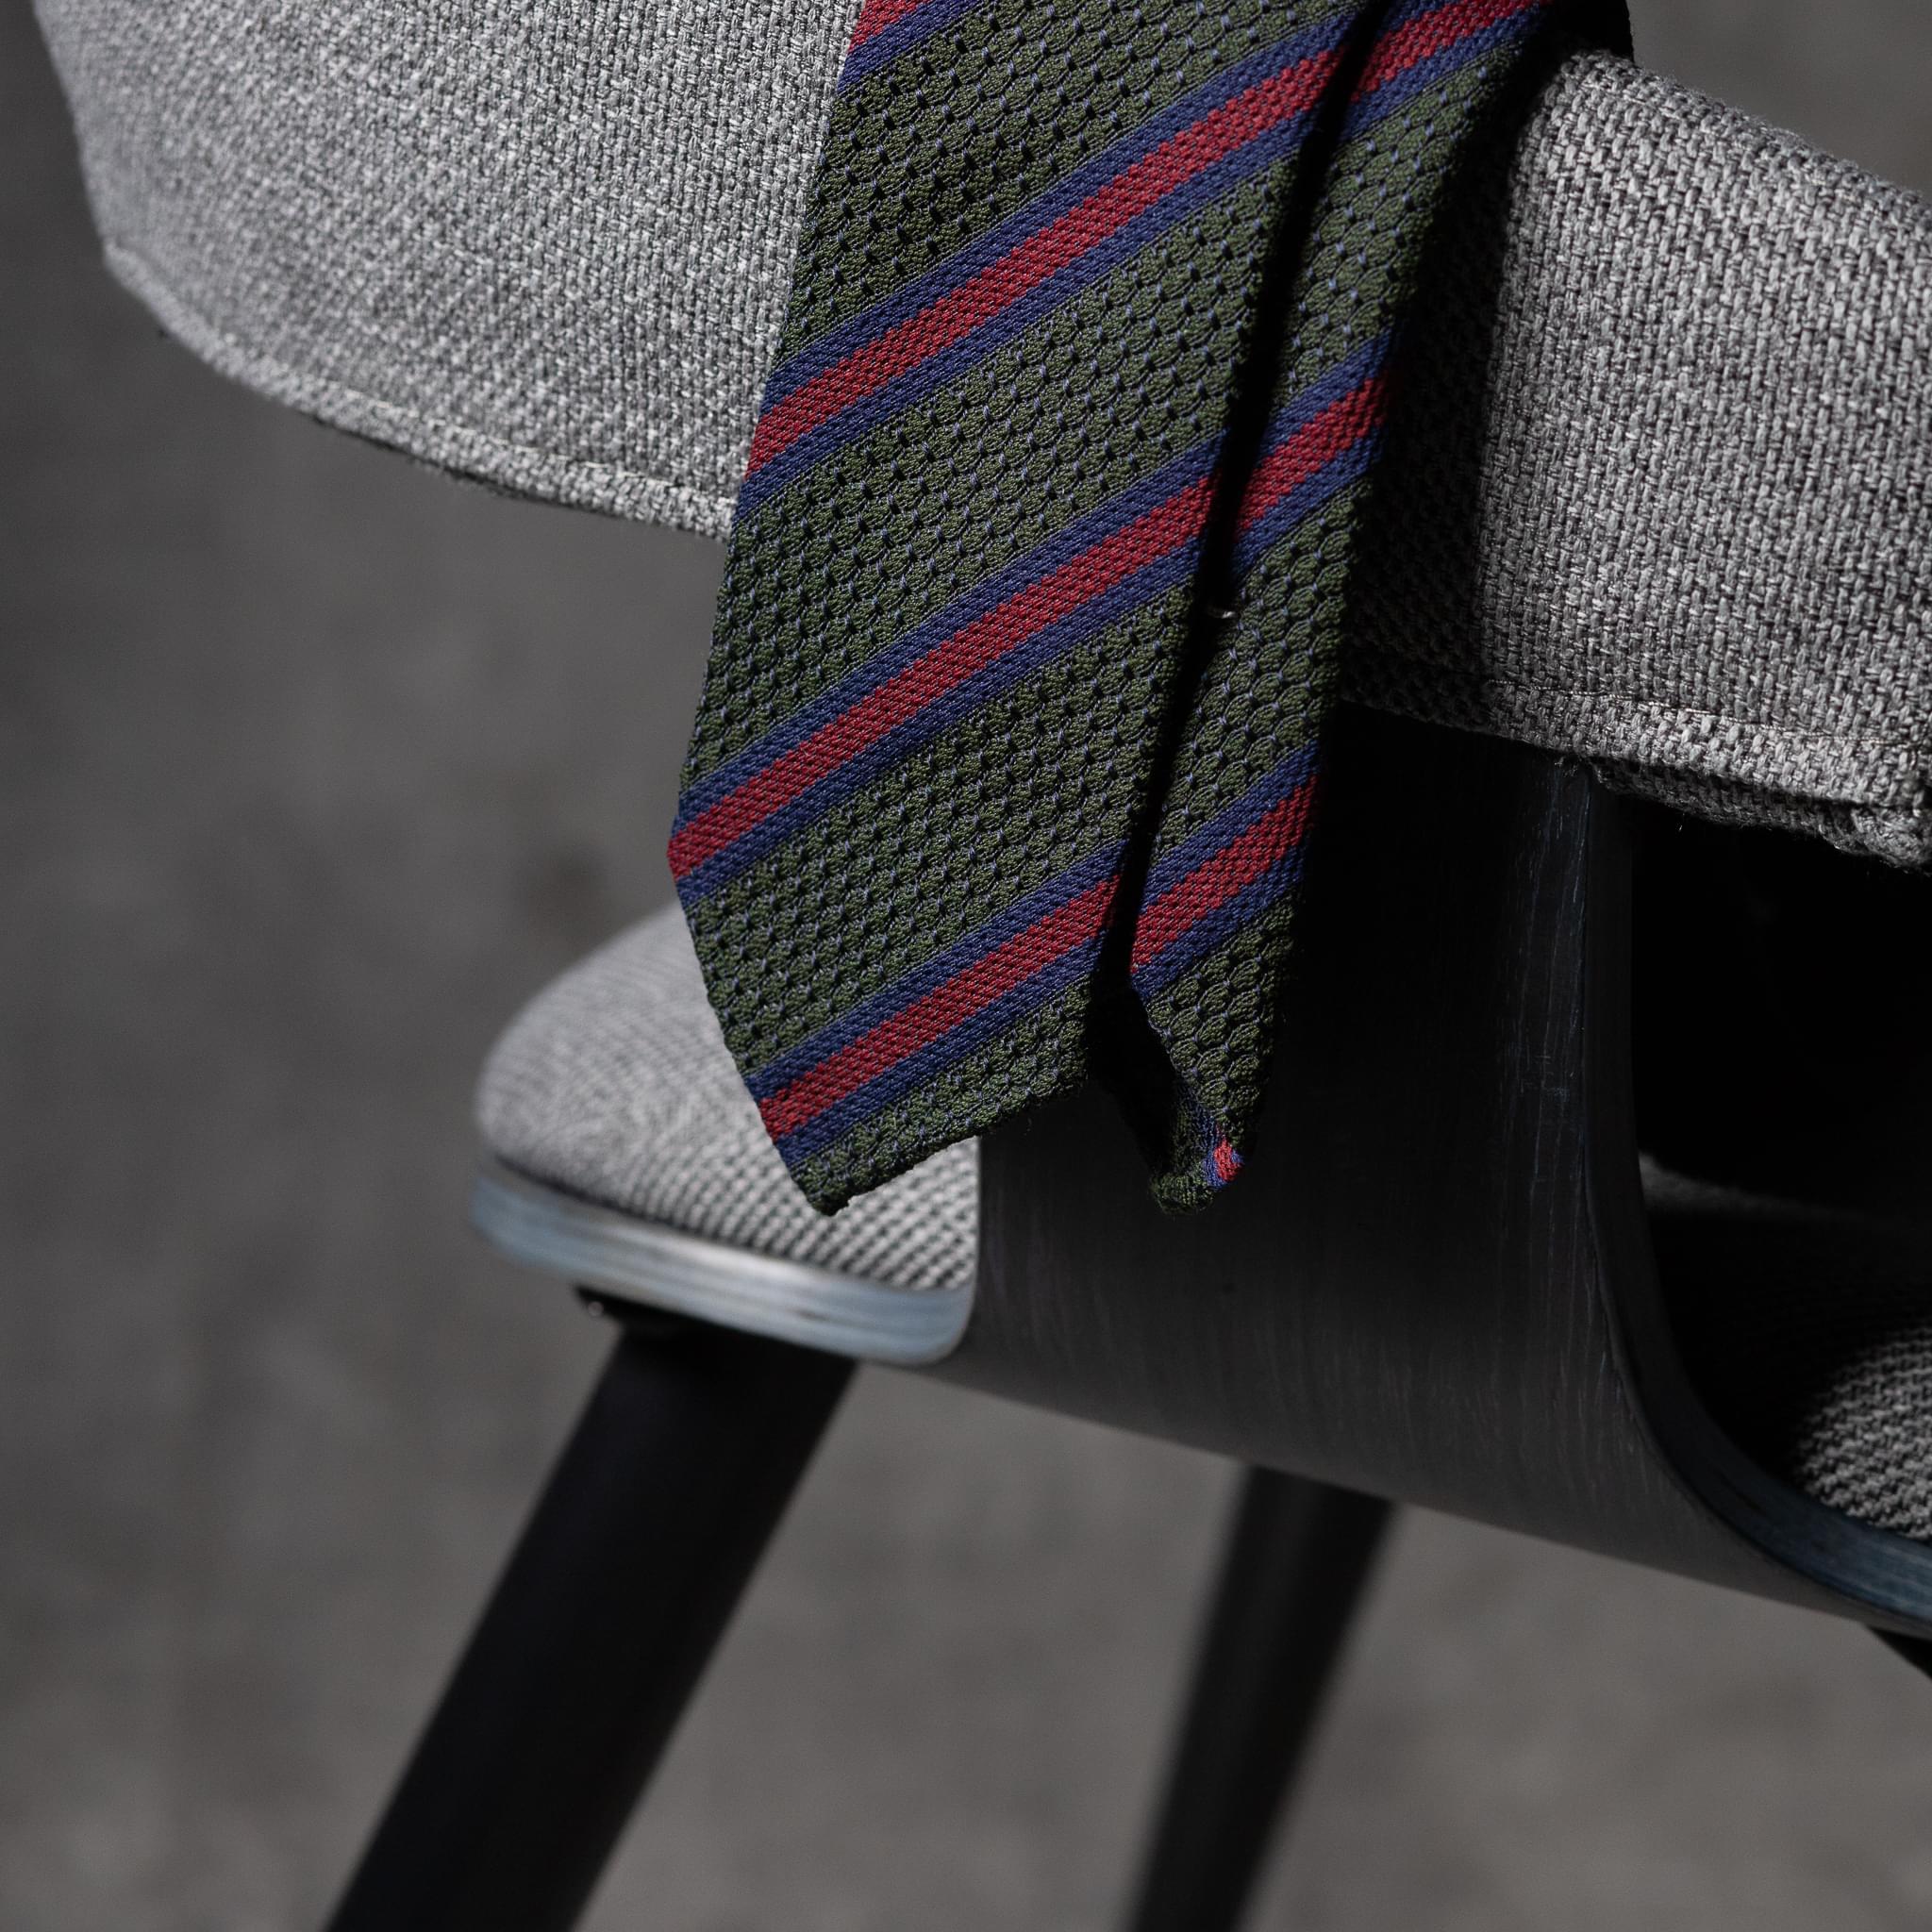 GRENADINE-0529-Tie-Initials-Corbata-Iniciales-The-Seelk-2